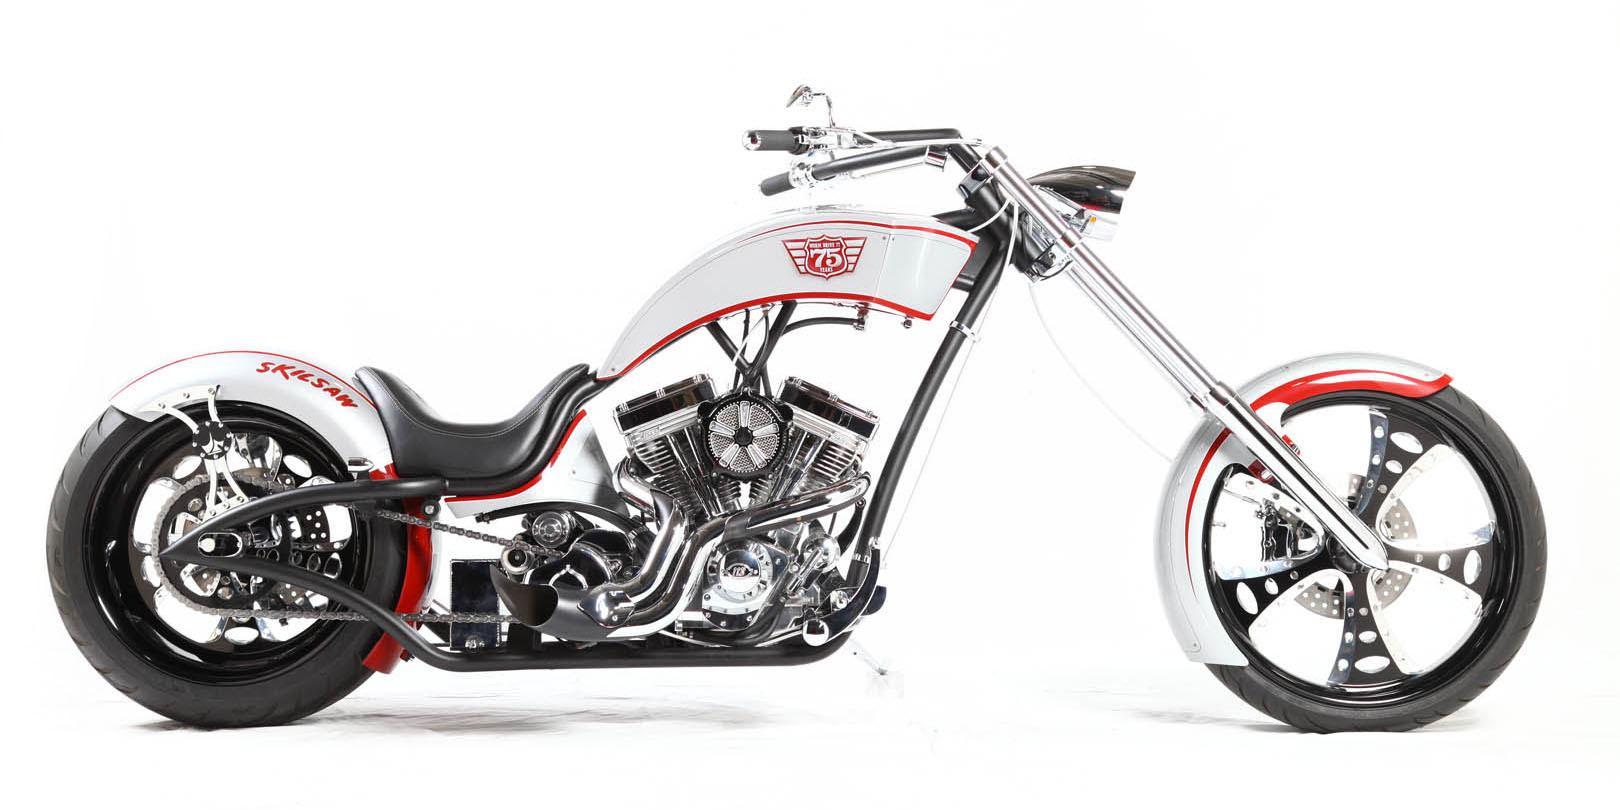 paul-jr-designs-skil-giveaway-bike-027-1